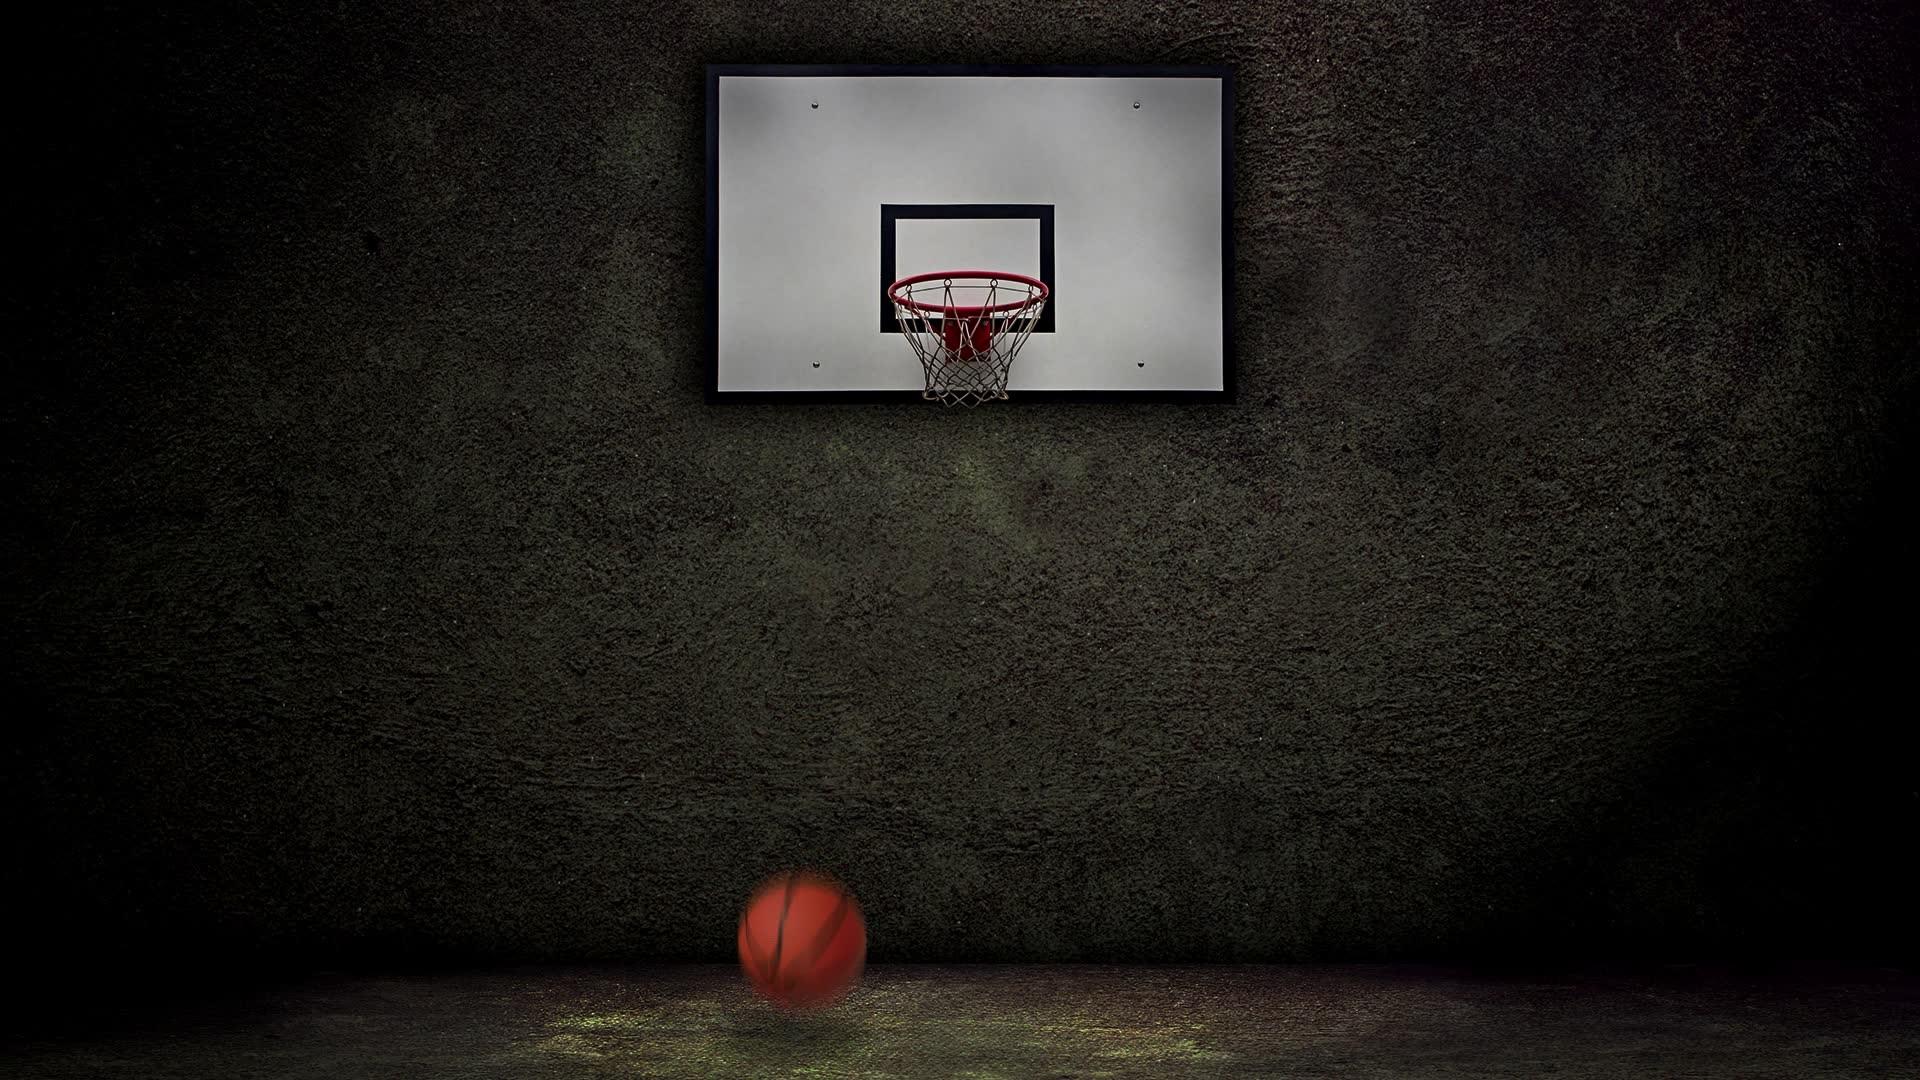 Damian Lillard Wallpapers Basketball Wallpapers at 1600×900 Basket  Wallpapers (40 Wallpapers)  